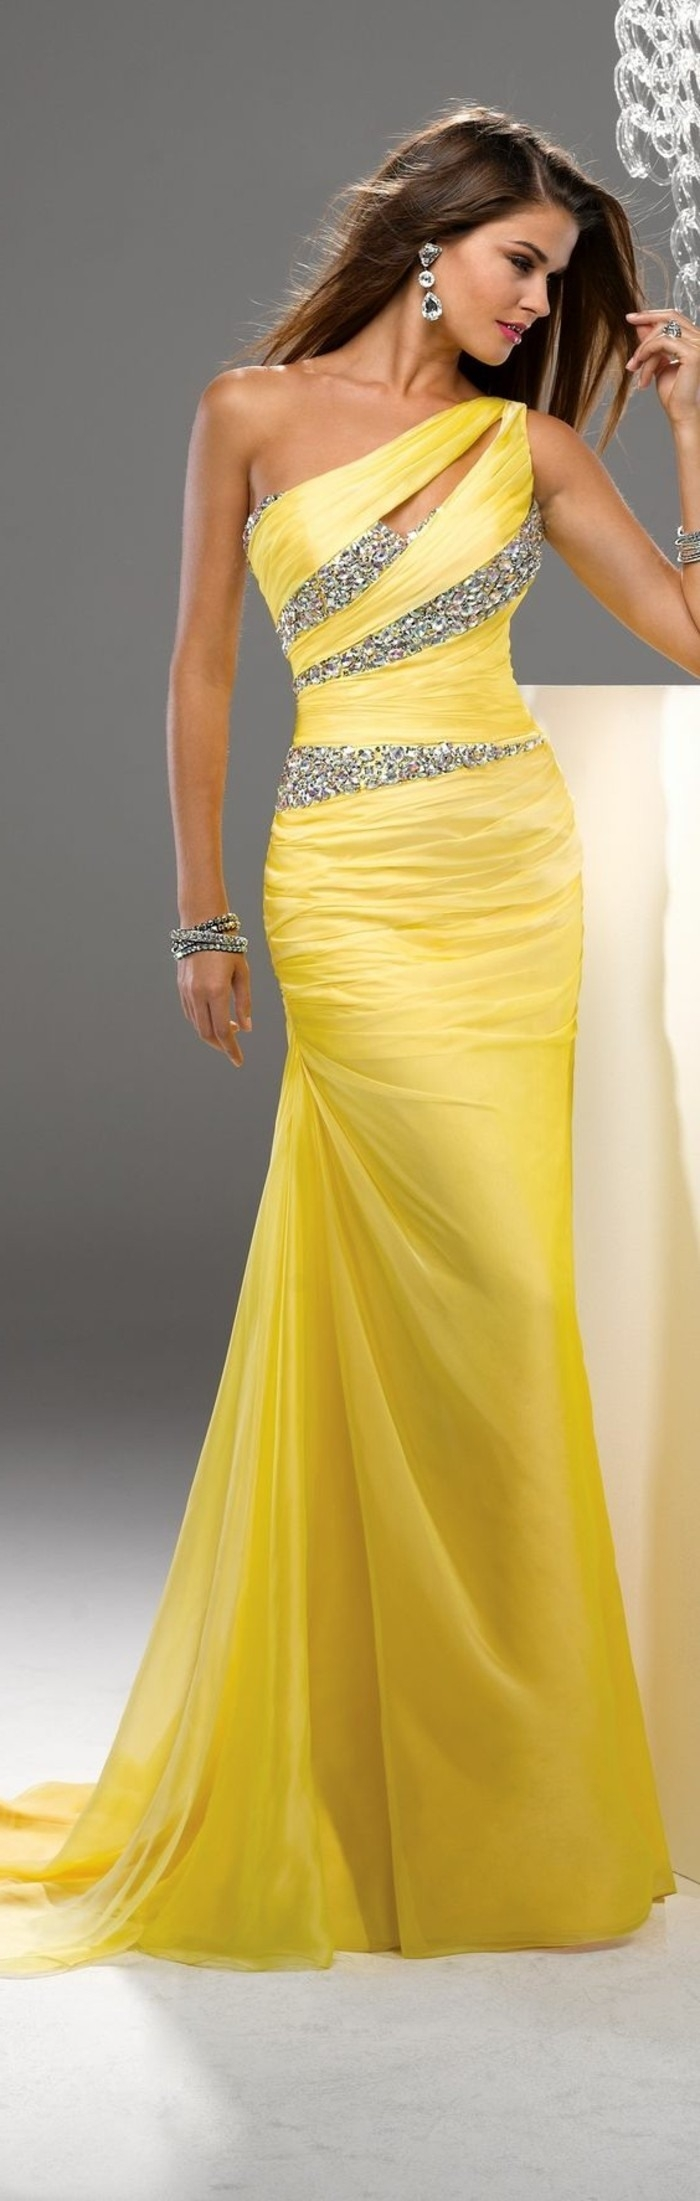 20 Großartig Moderne Elegante Kleider Ärmel17 Perfekt Moderne Elegante Kleider Galerie